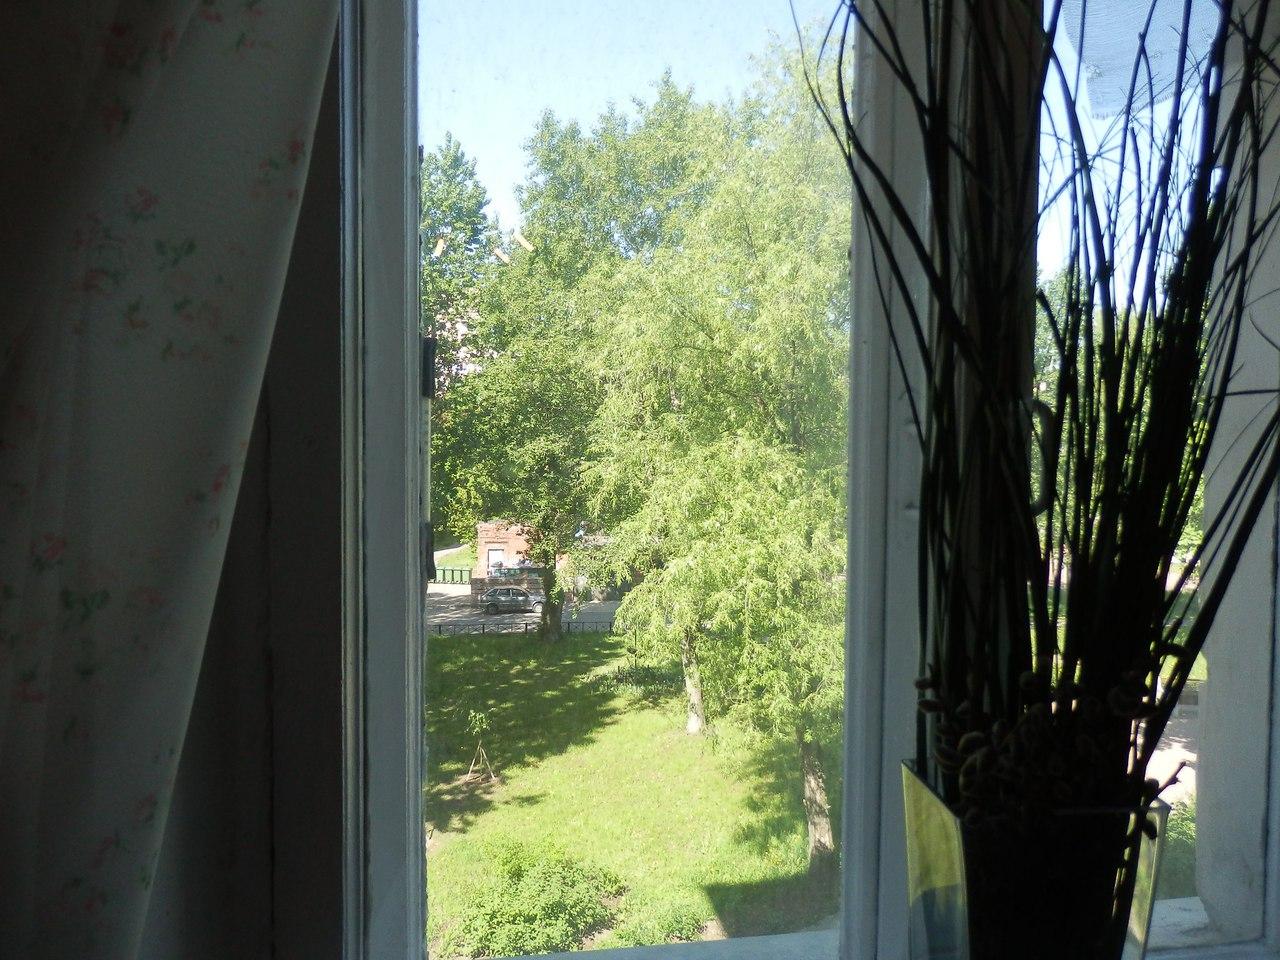 Продается 1 комната в квартире, Красногвардейский район, набережная, Петербург BaqTsxSpzY4